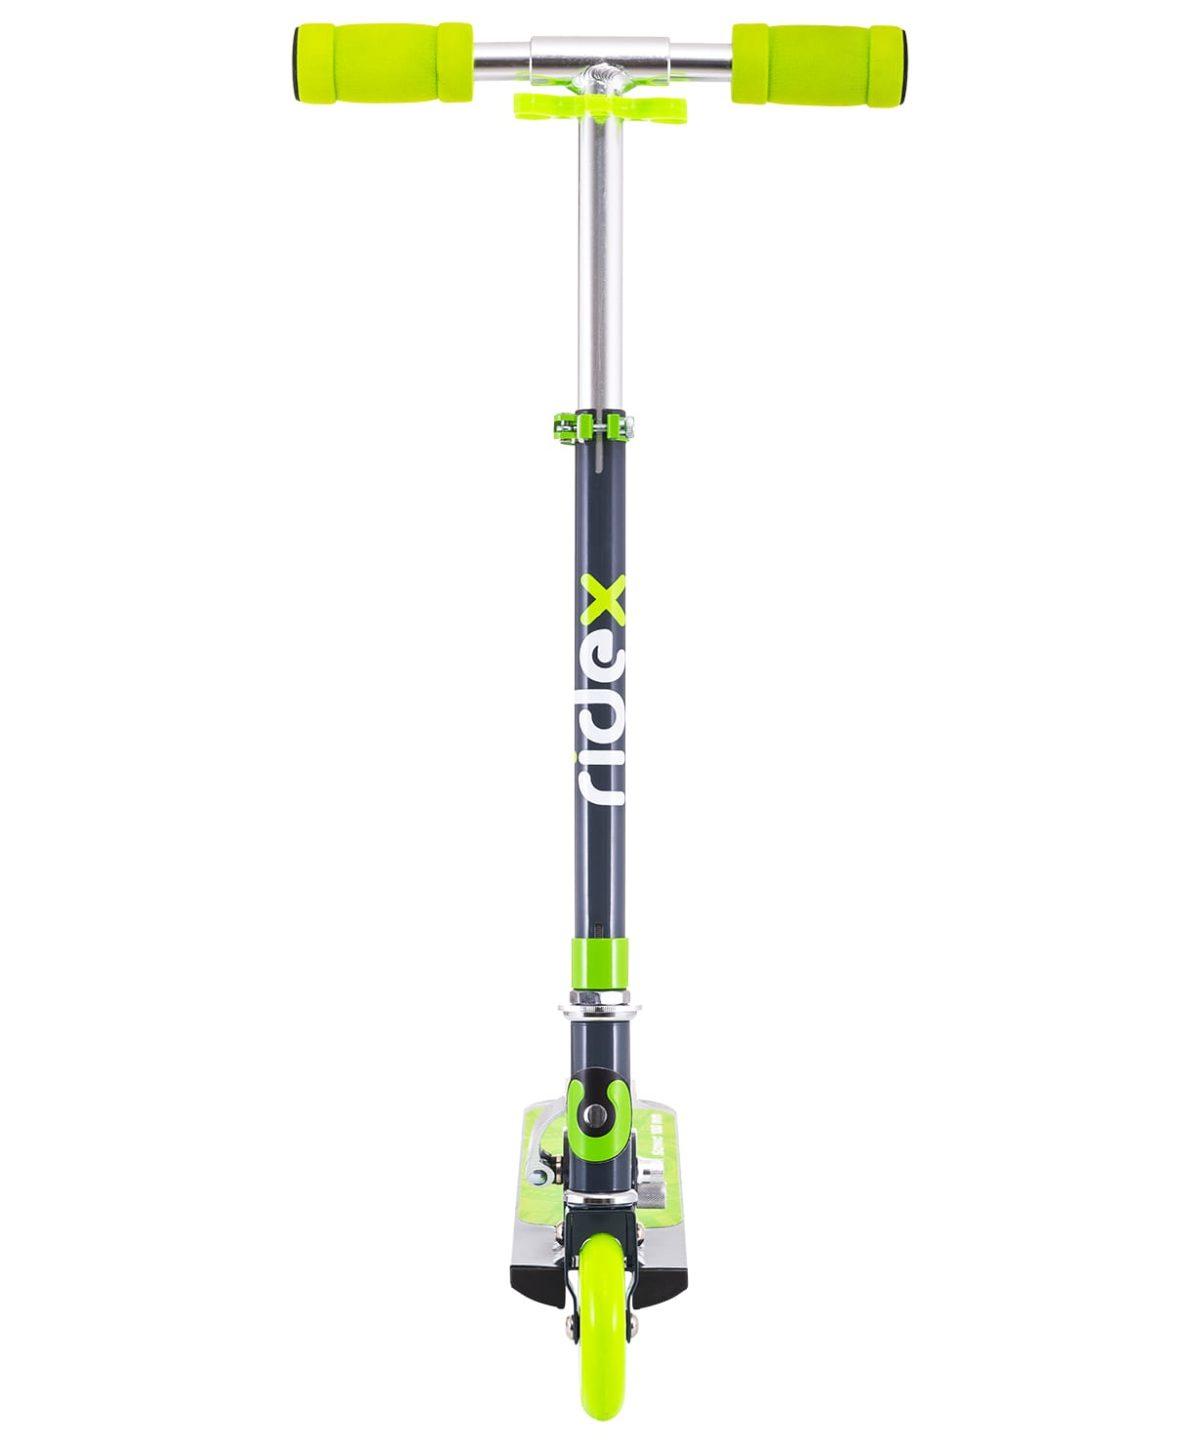 RIDEX Sonic Самокат 2-колесный  100 мм  Sonic: зелёный - 3